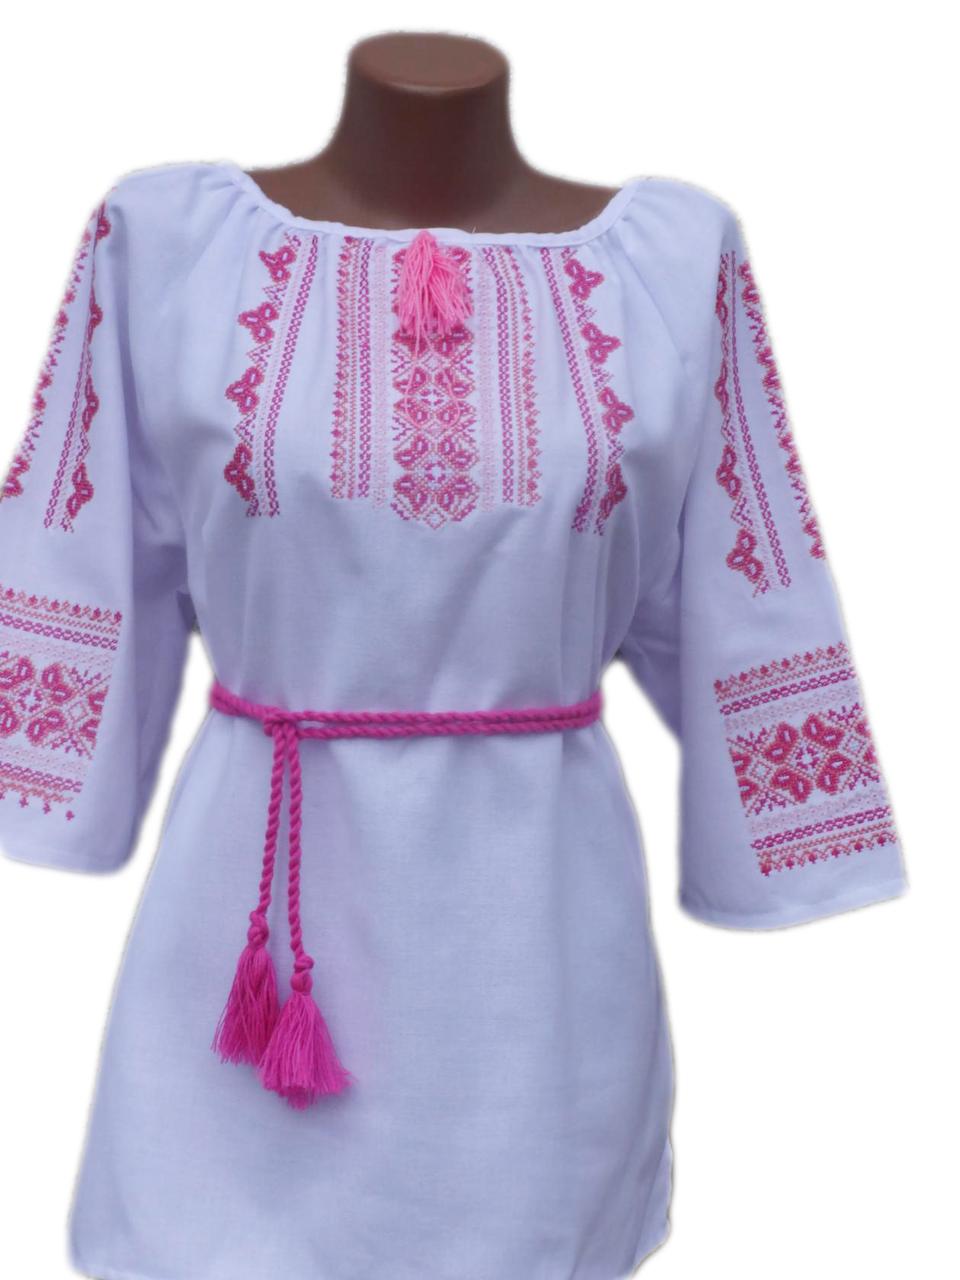 "Жіноча вишита сорочка (блузка) ""Іоанна"" (Женская вышитая рубашка (блузка) ""Иоанна"") BN-0056"